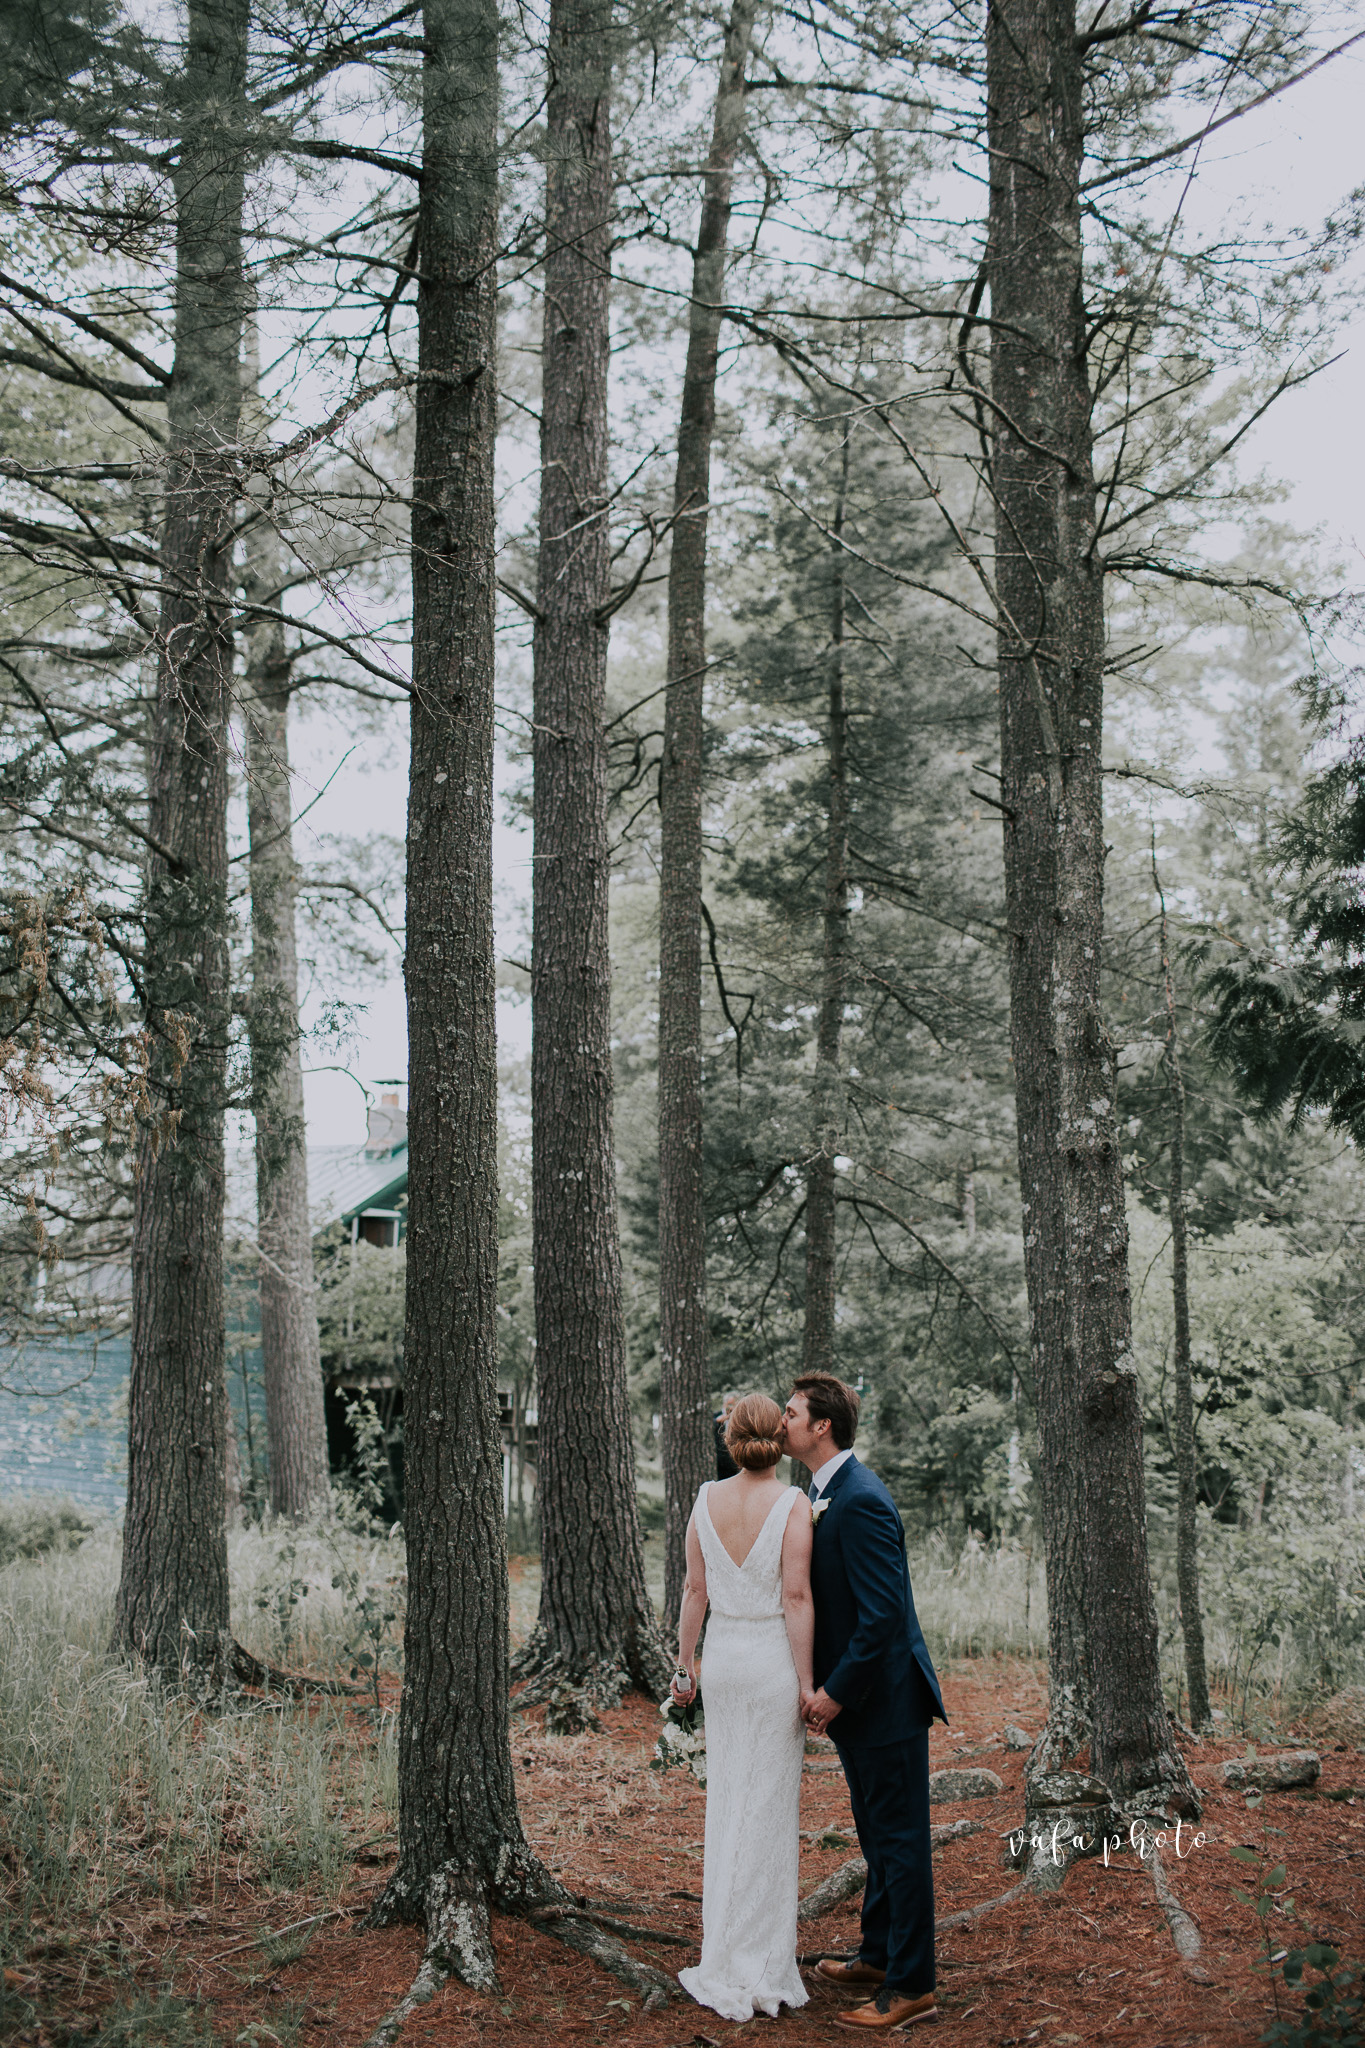 Michigan-Lake-House-Wedding-Madeline-Patrick-Vafa-Photo-578.jpg